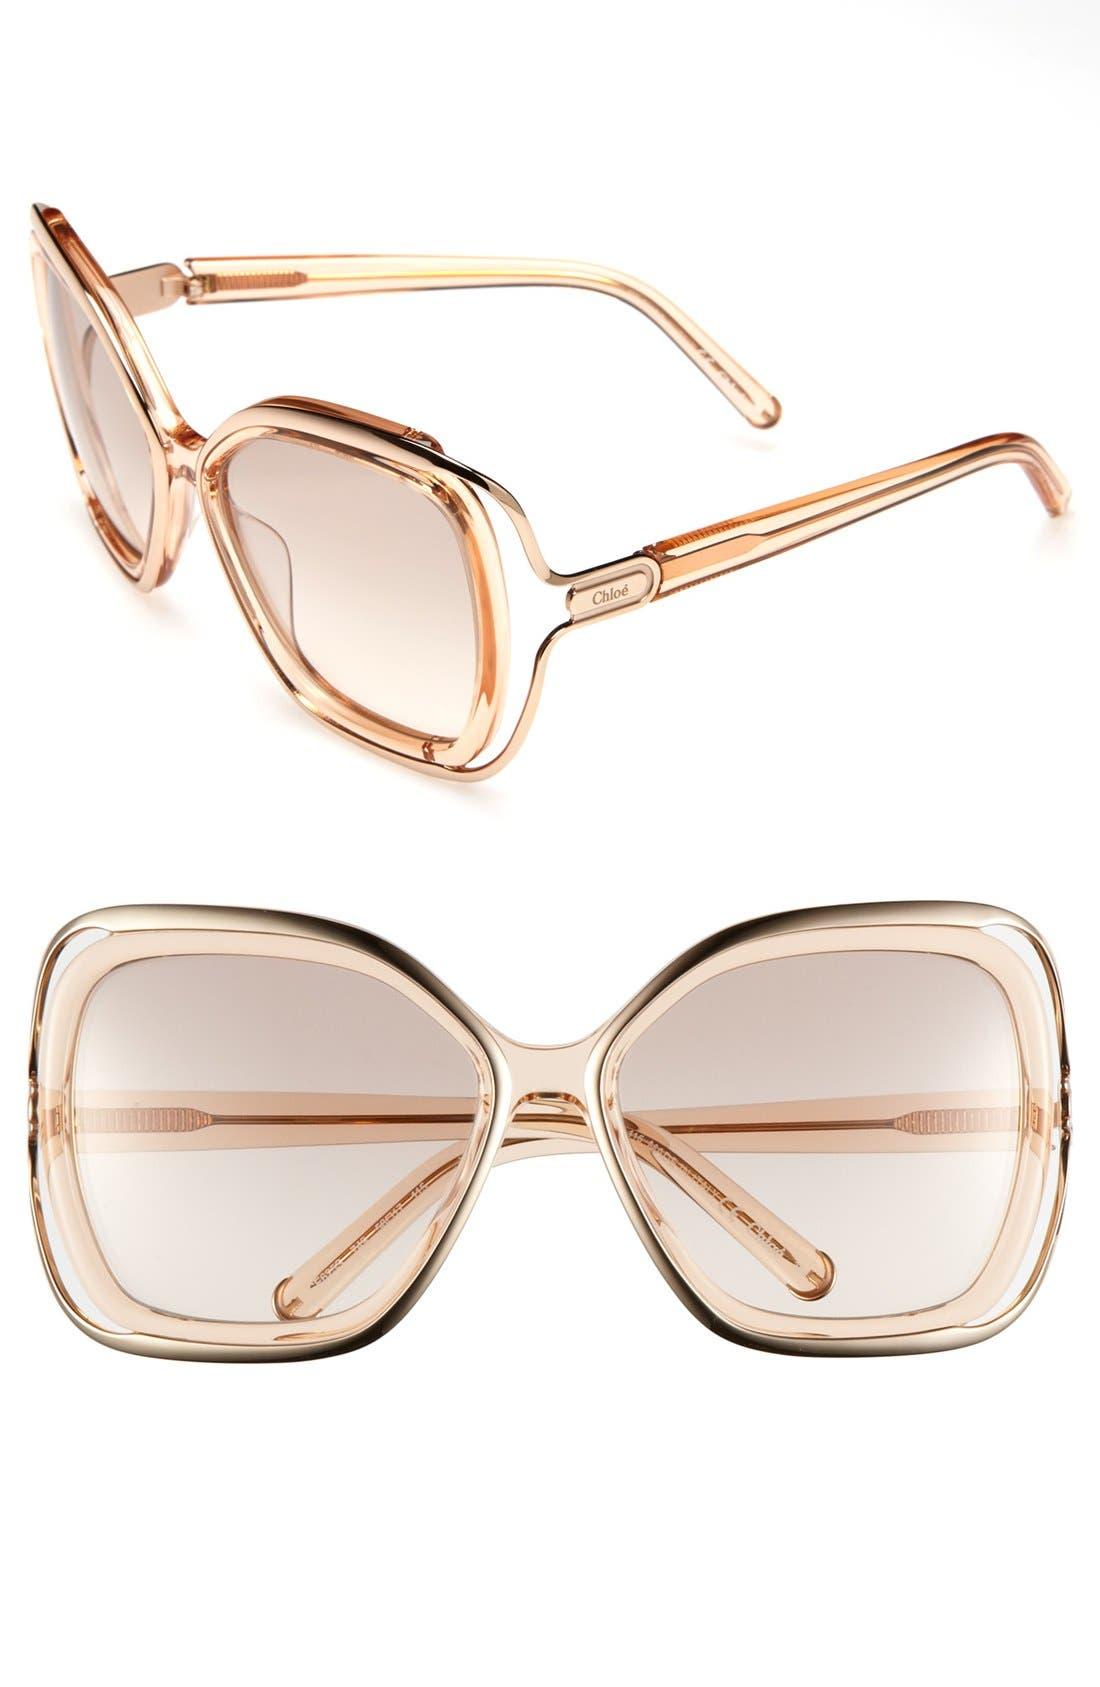 Alternate Image 1 Selected - Chloé 56mm Sunglasses